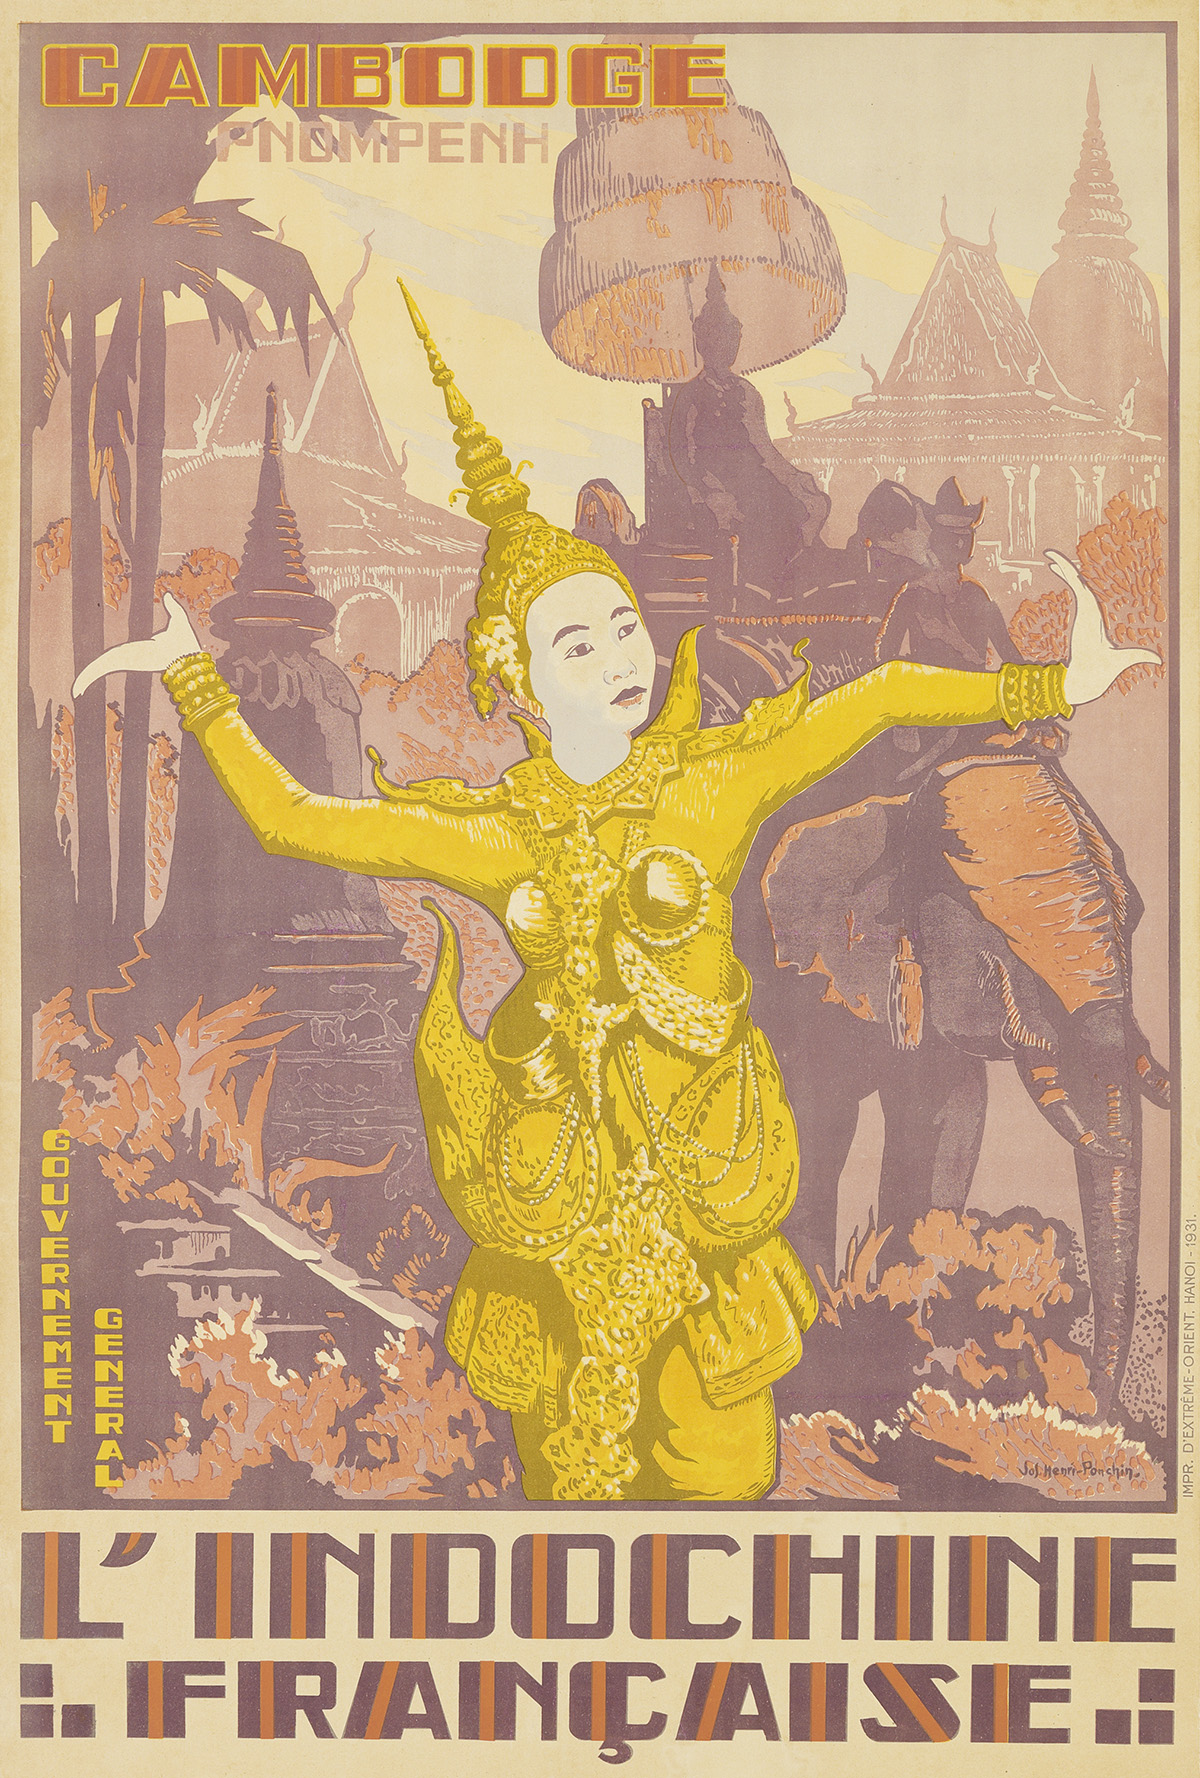 JOSEPH-HENRI-PONCHIN-(1897-1962)-CAMBODGE-PNOM-PENH--LINDOCHINE-FRANÇAISE-1931-43x29-inches-110x73-cm-DExtreme-Orient-Hanoi